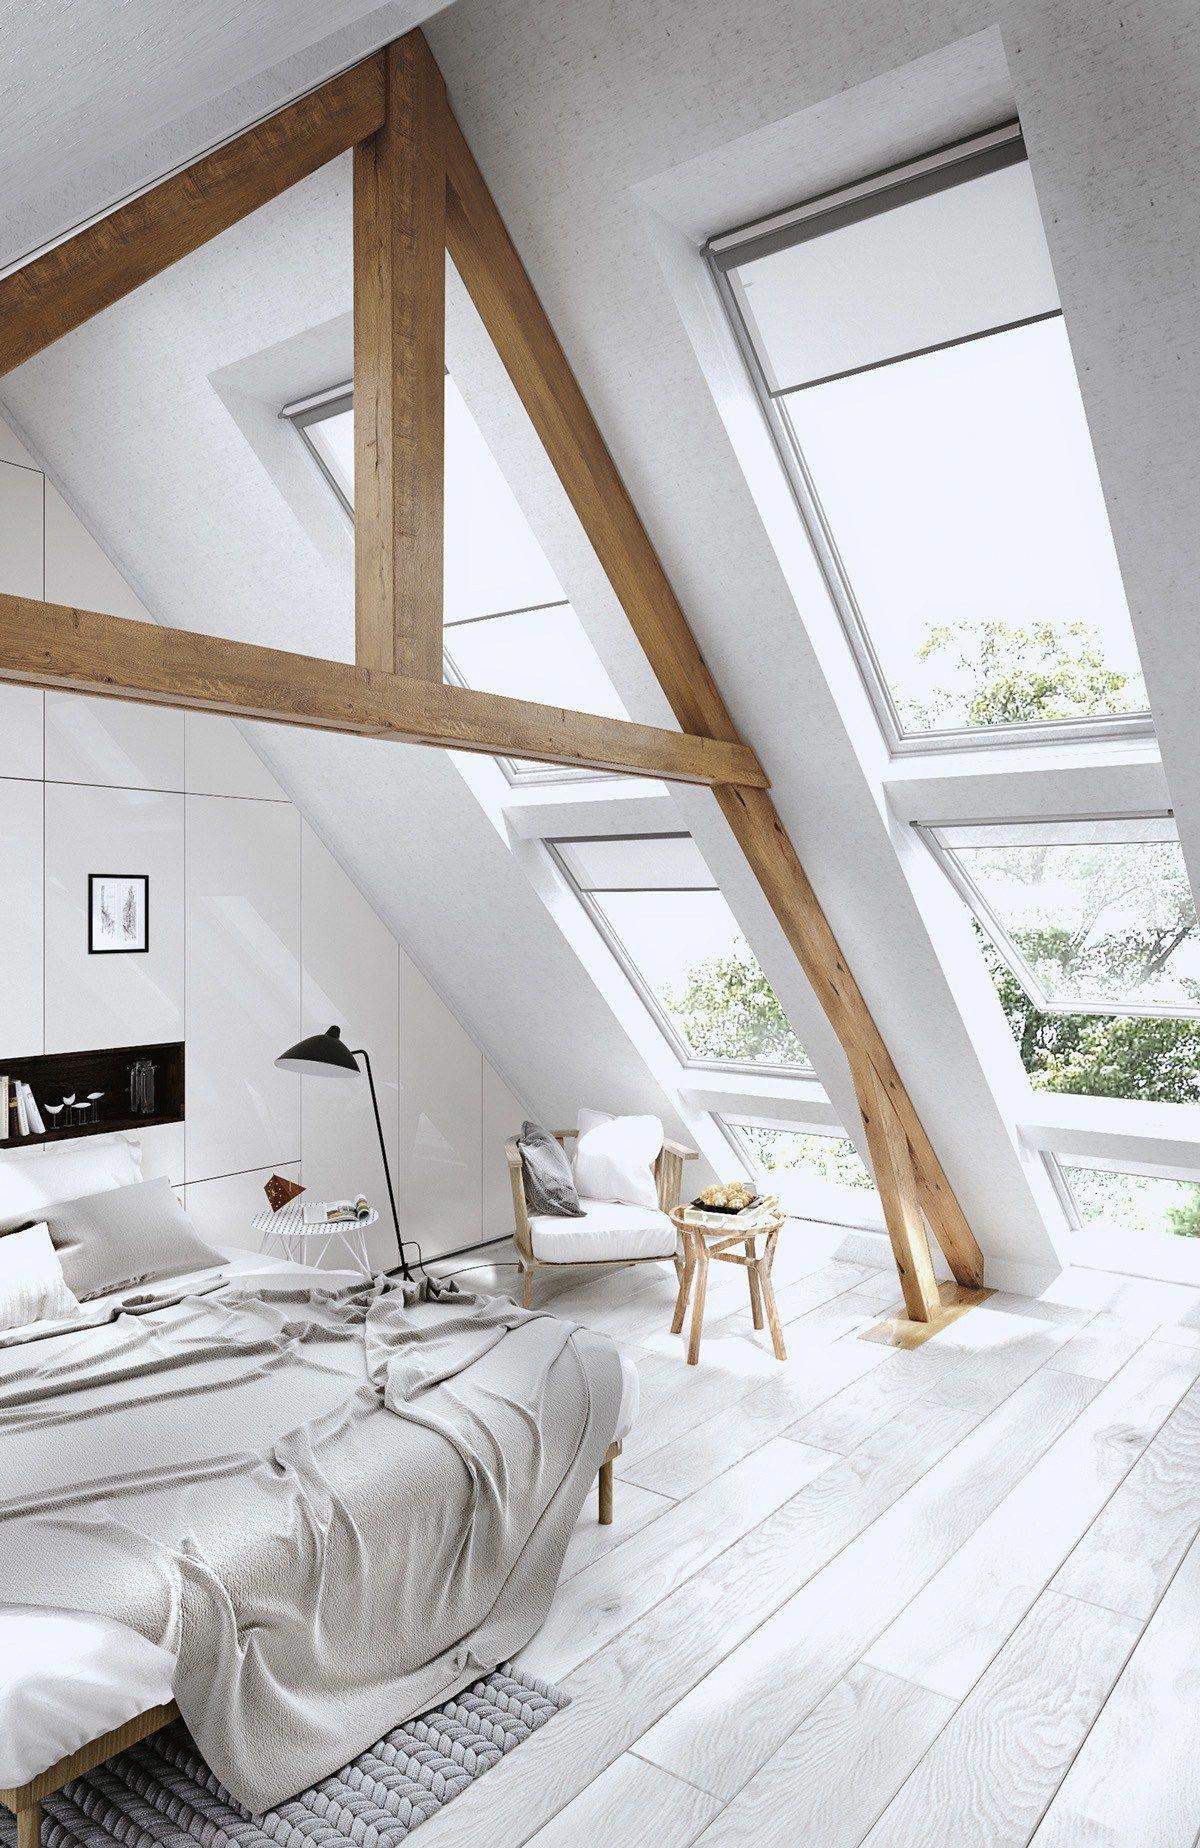 13 Beautiful Attic Room Without Building Regulations Ideas In 2020 Attic Bedroom Small Attic Bedroom Designs Attic Design